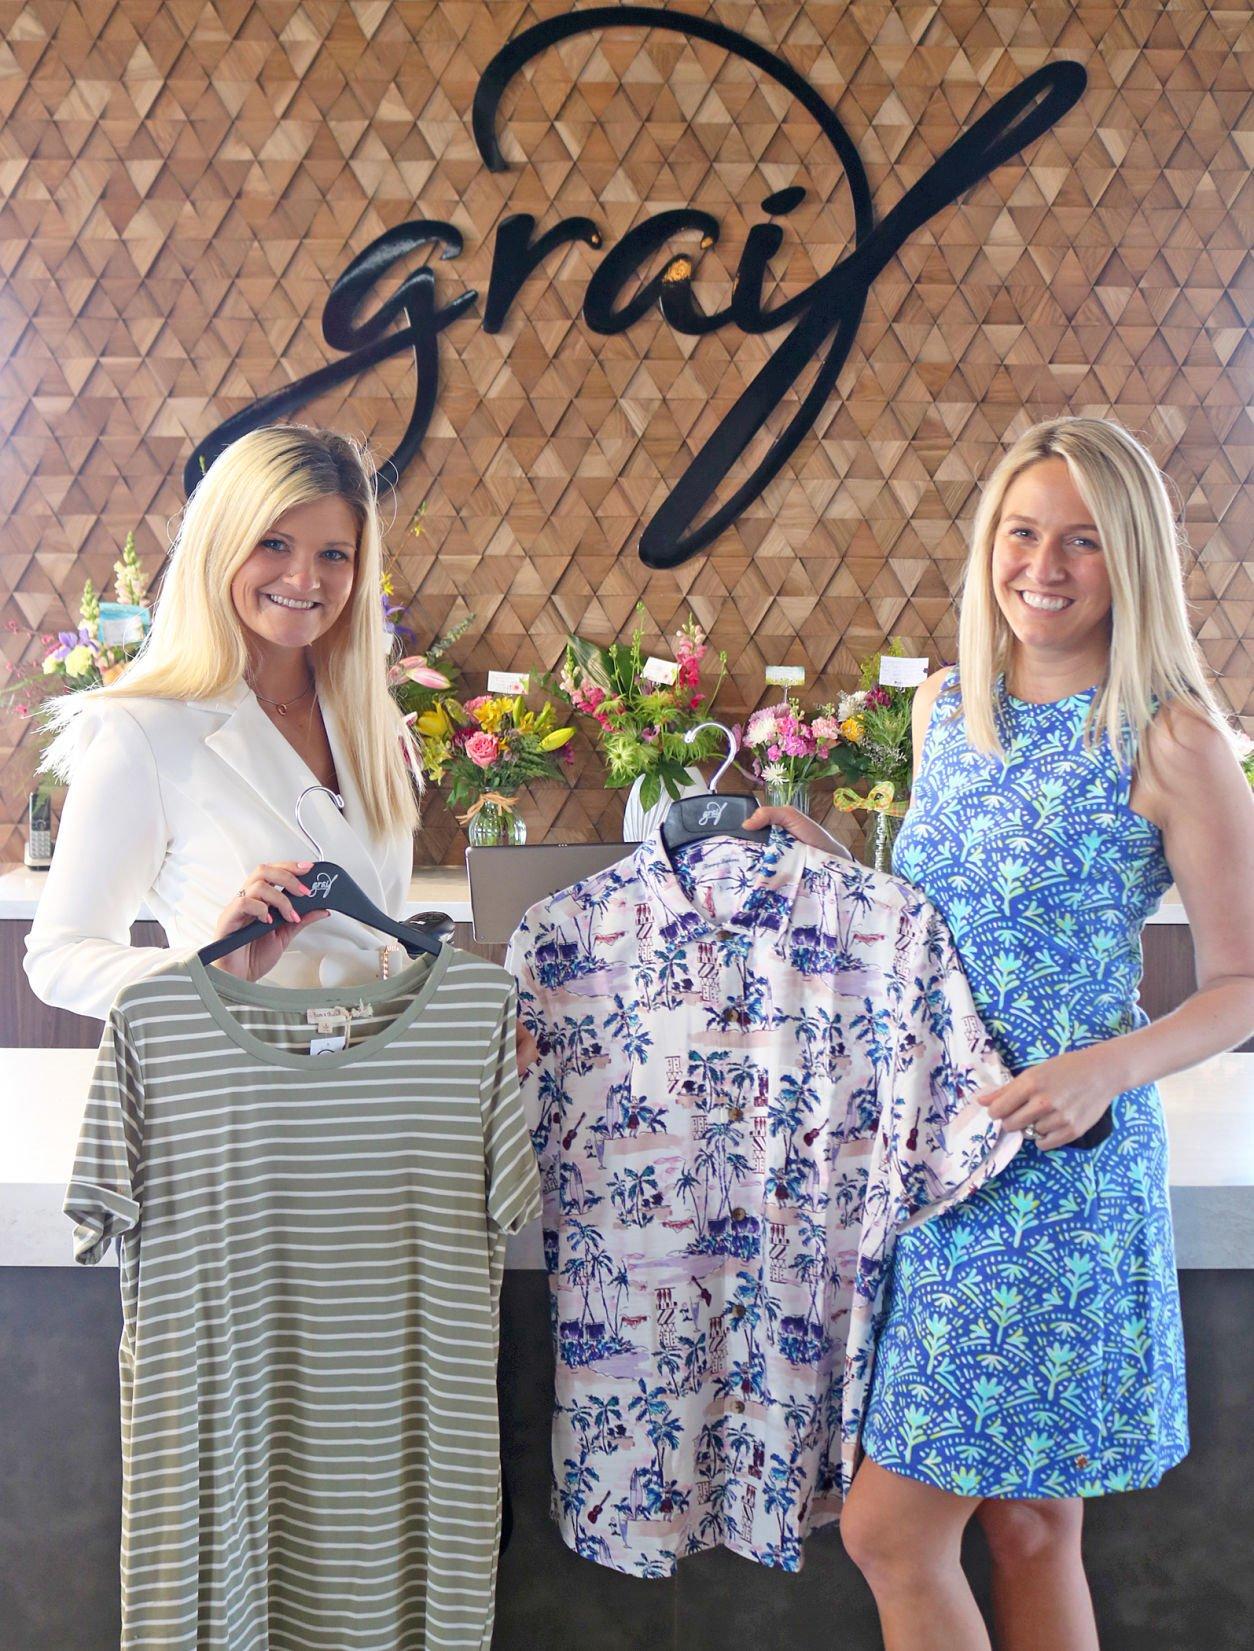 Graif Clothing